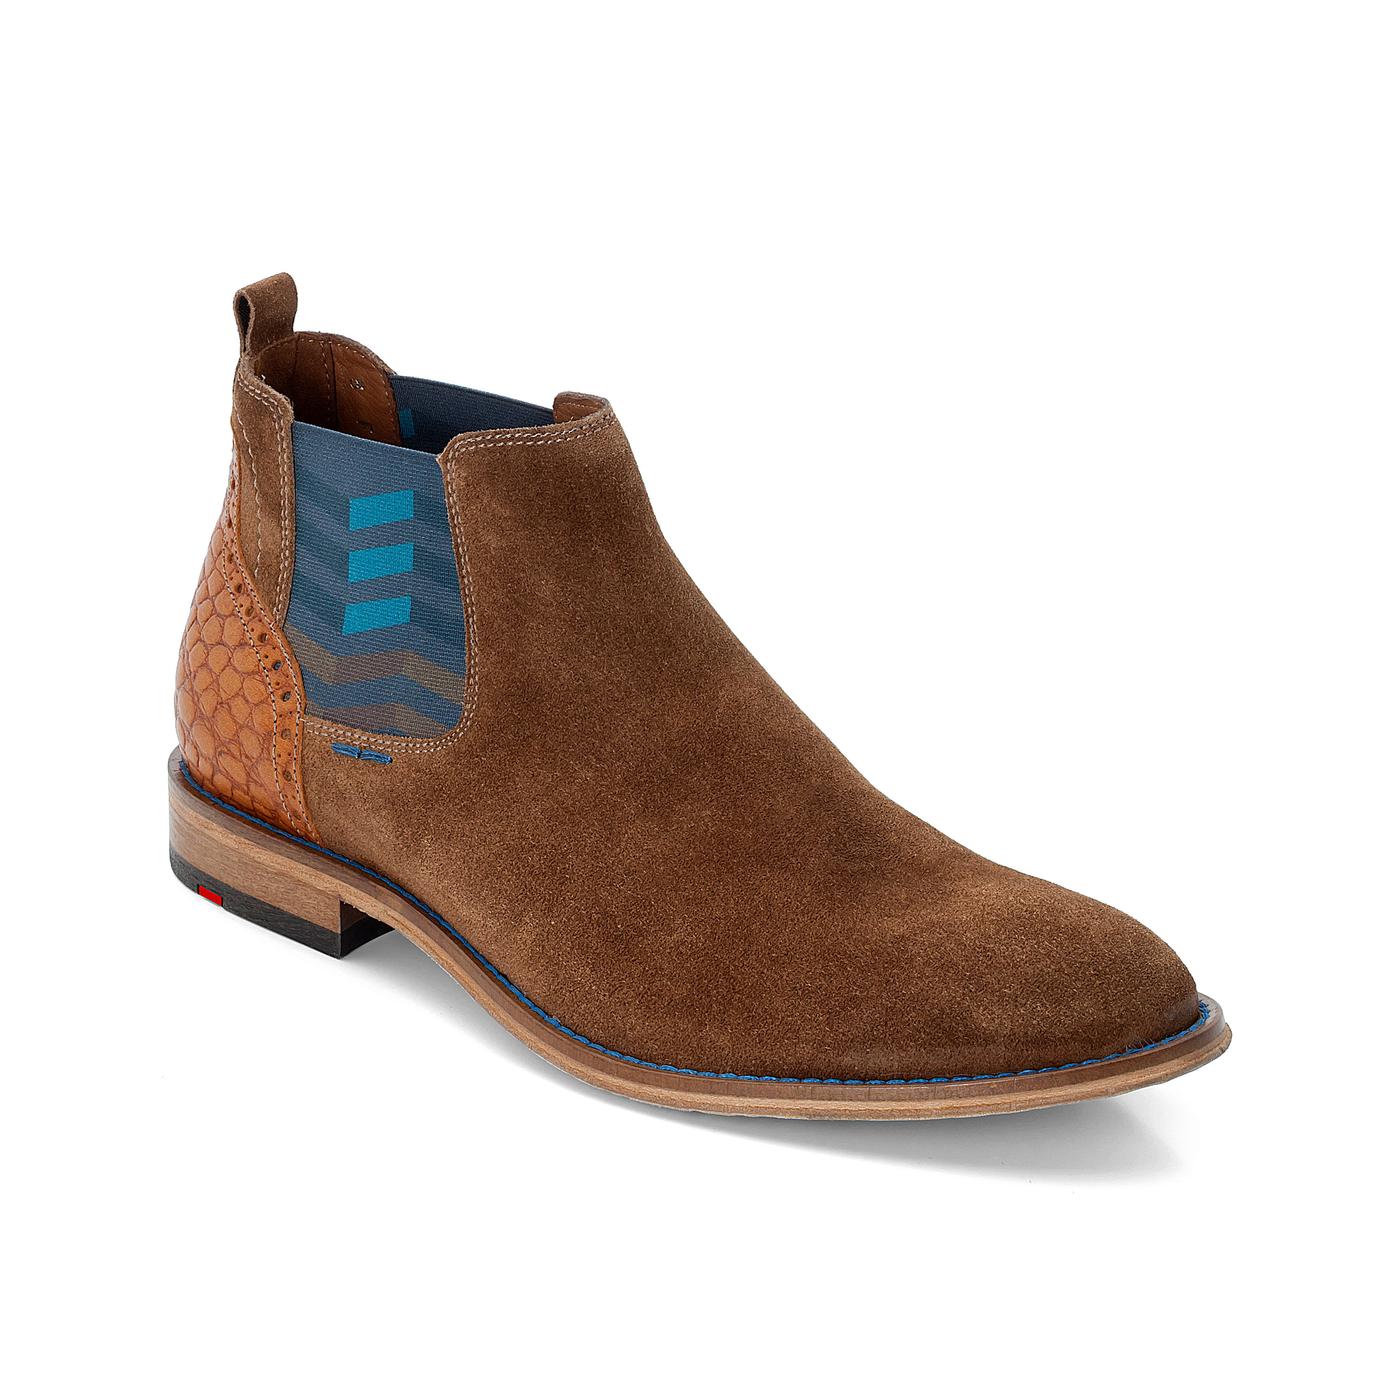 HOBSON | Schuhe > Boots > Chelsea-Boots | Lloyd